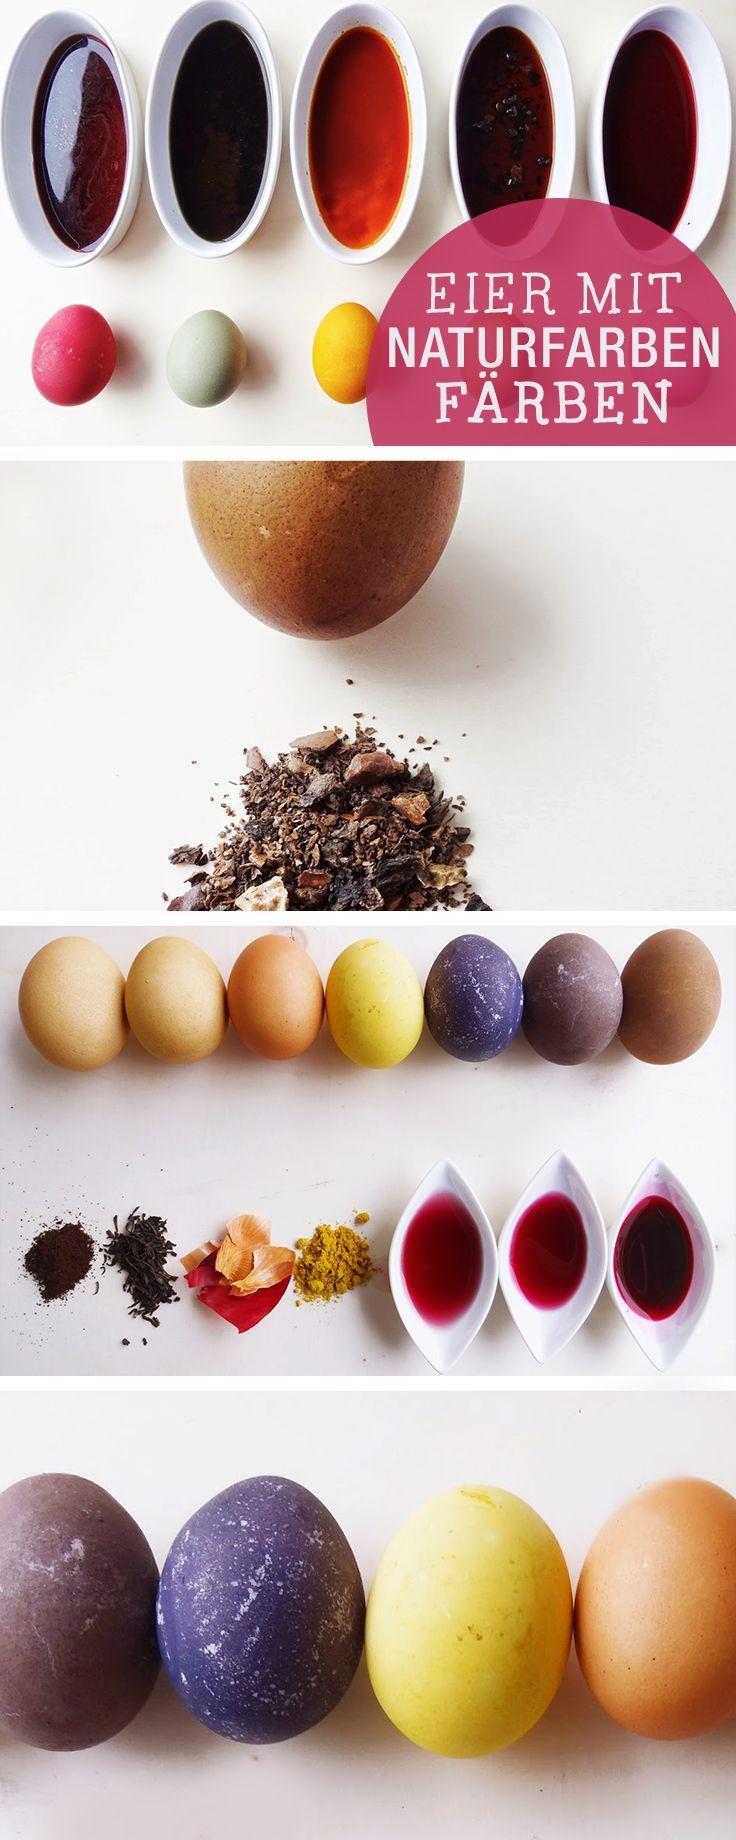 DIY-Anleitung: Ostereier mit Naturfarben färben / diy tutorial: how to colour e…